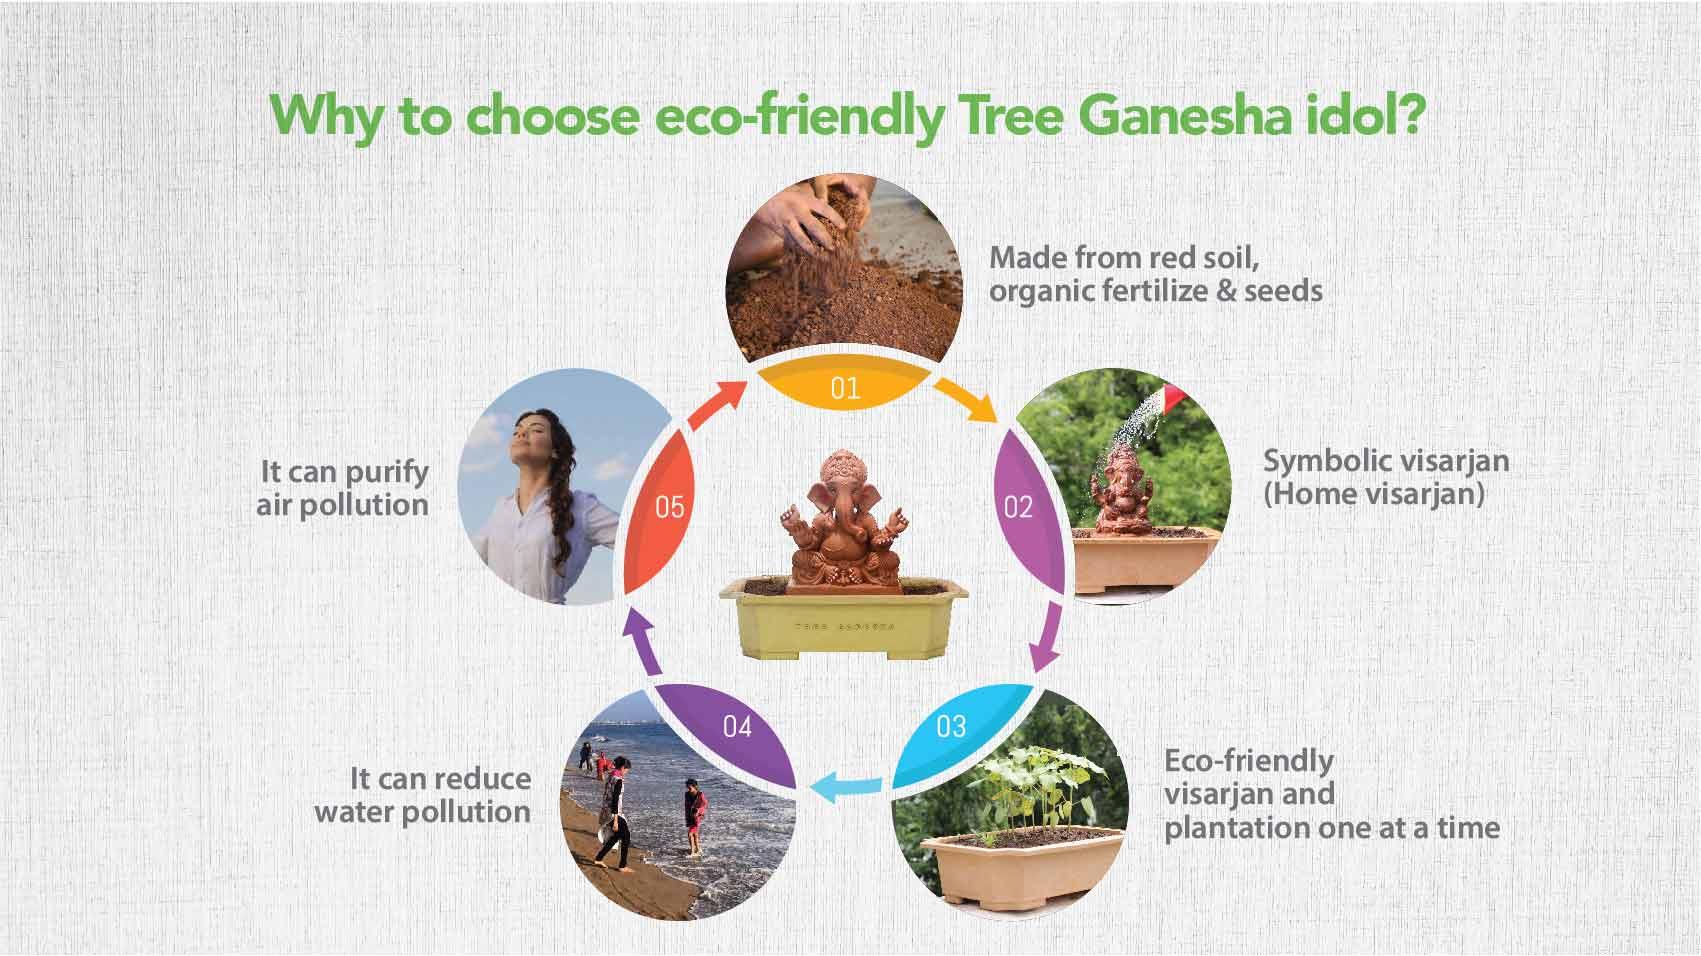 About Tree Ganesha